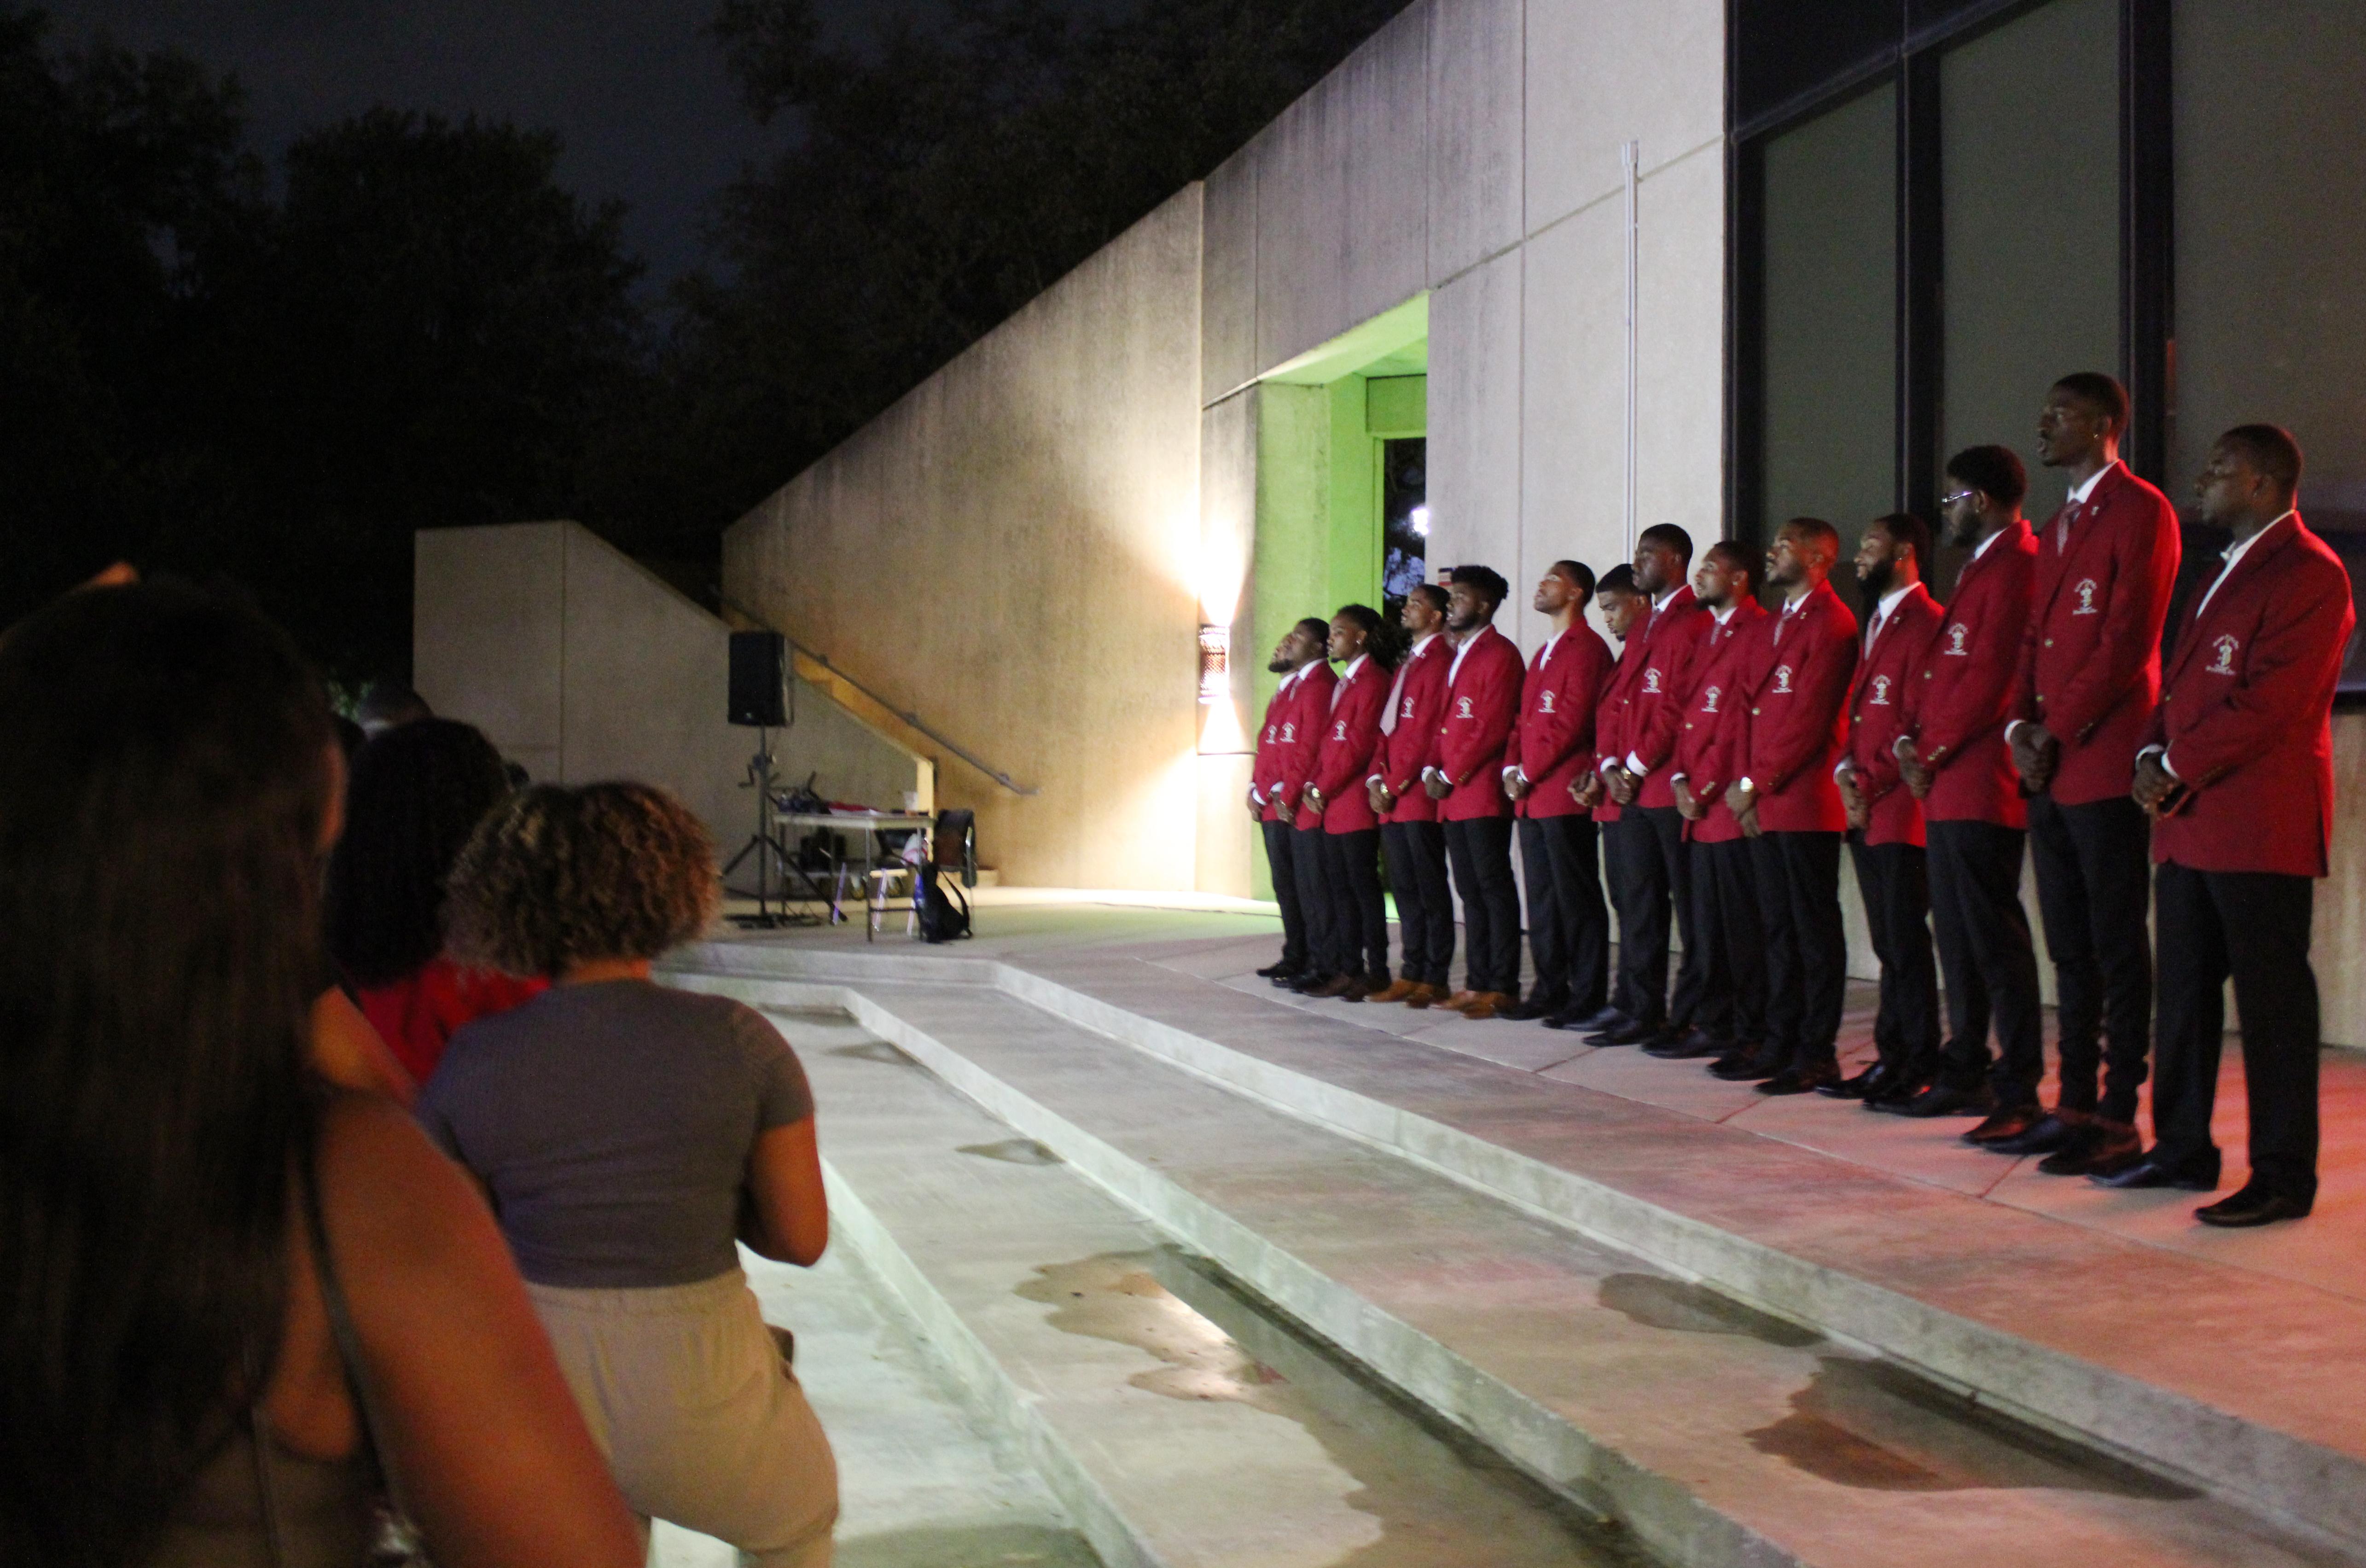 Kappa Alpha Psi choir members